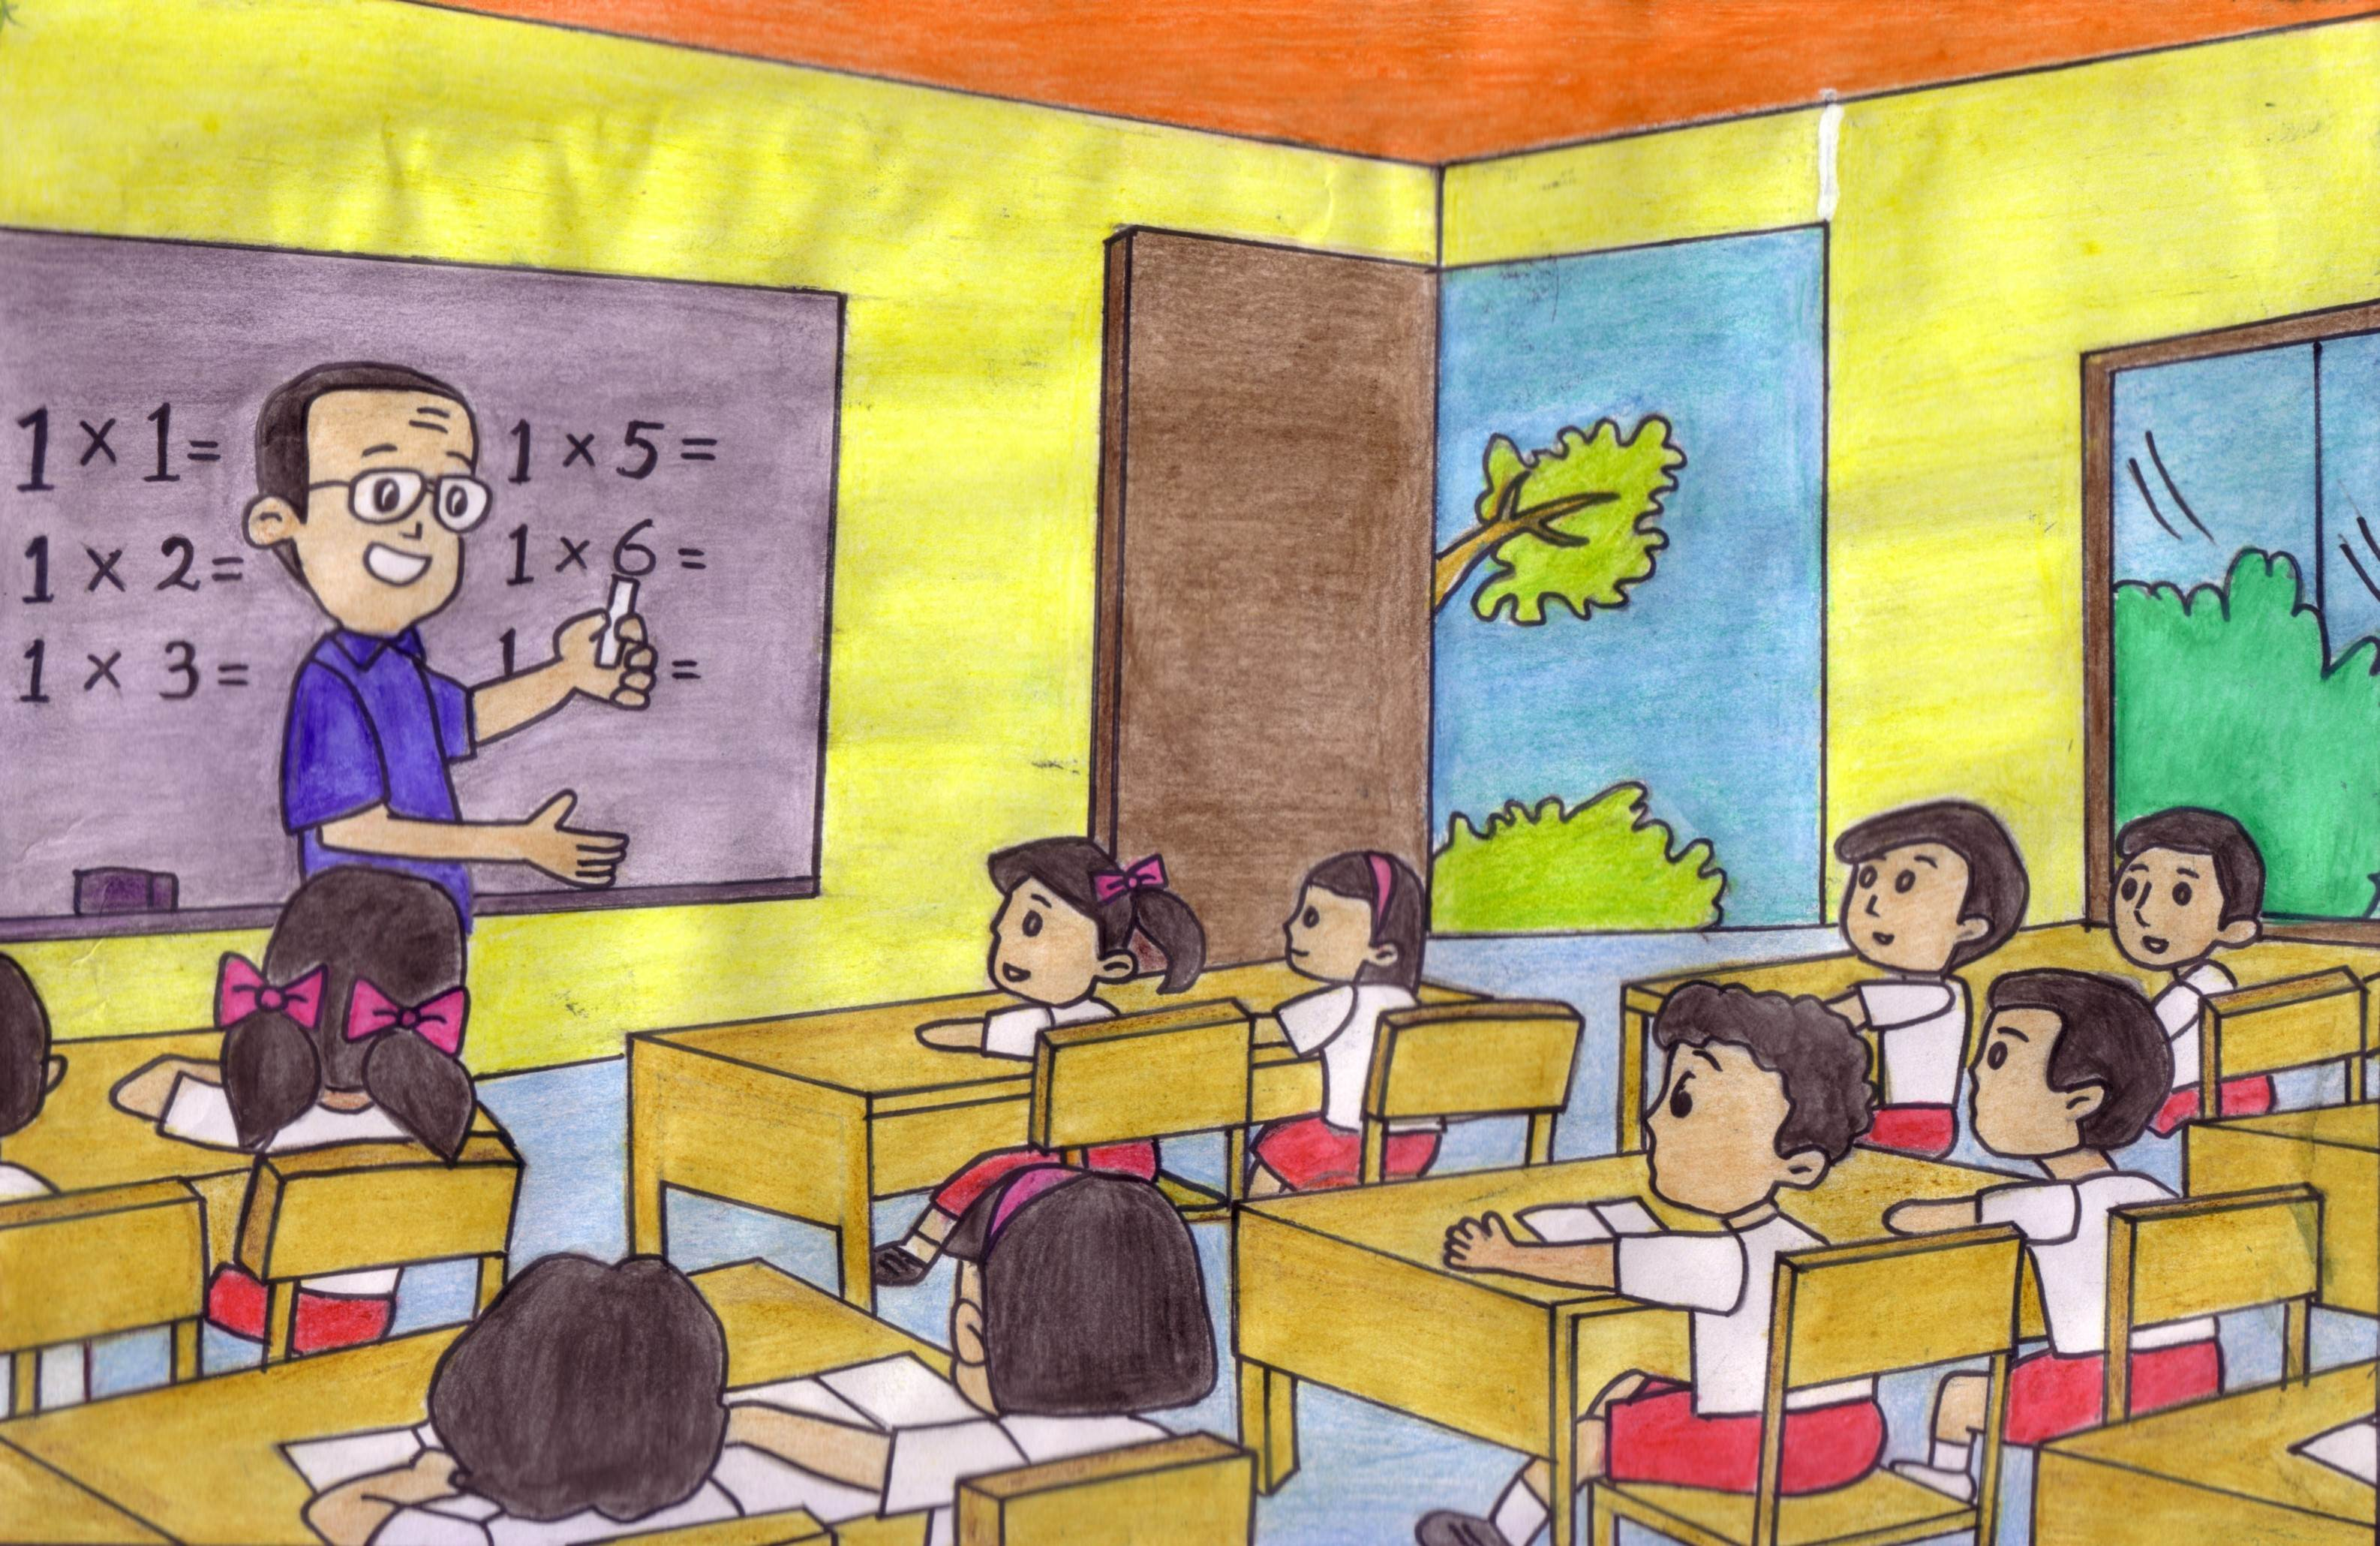 Beginikah sikap guru patut dicontohi?